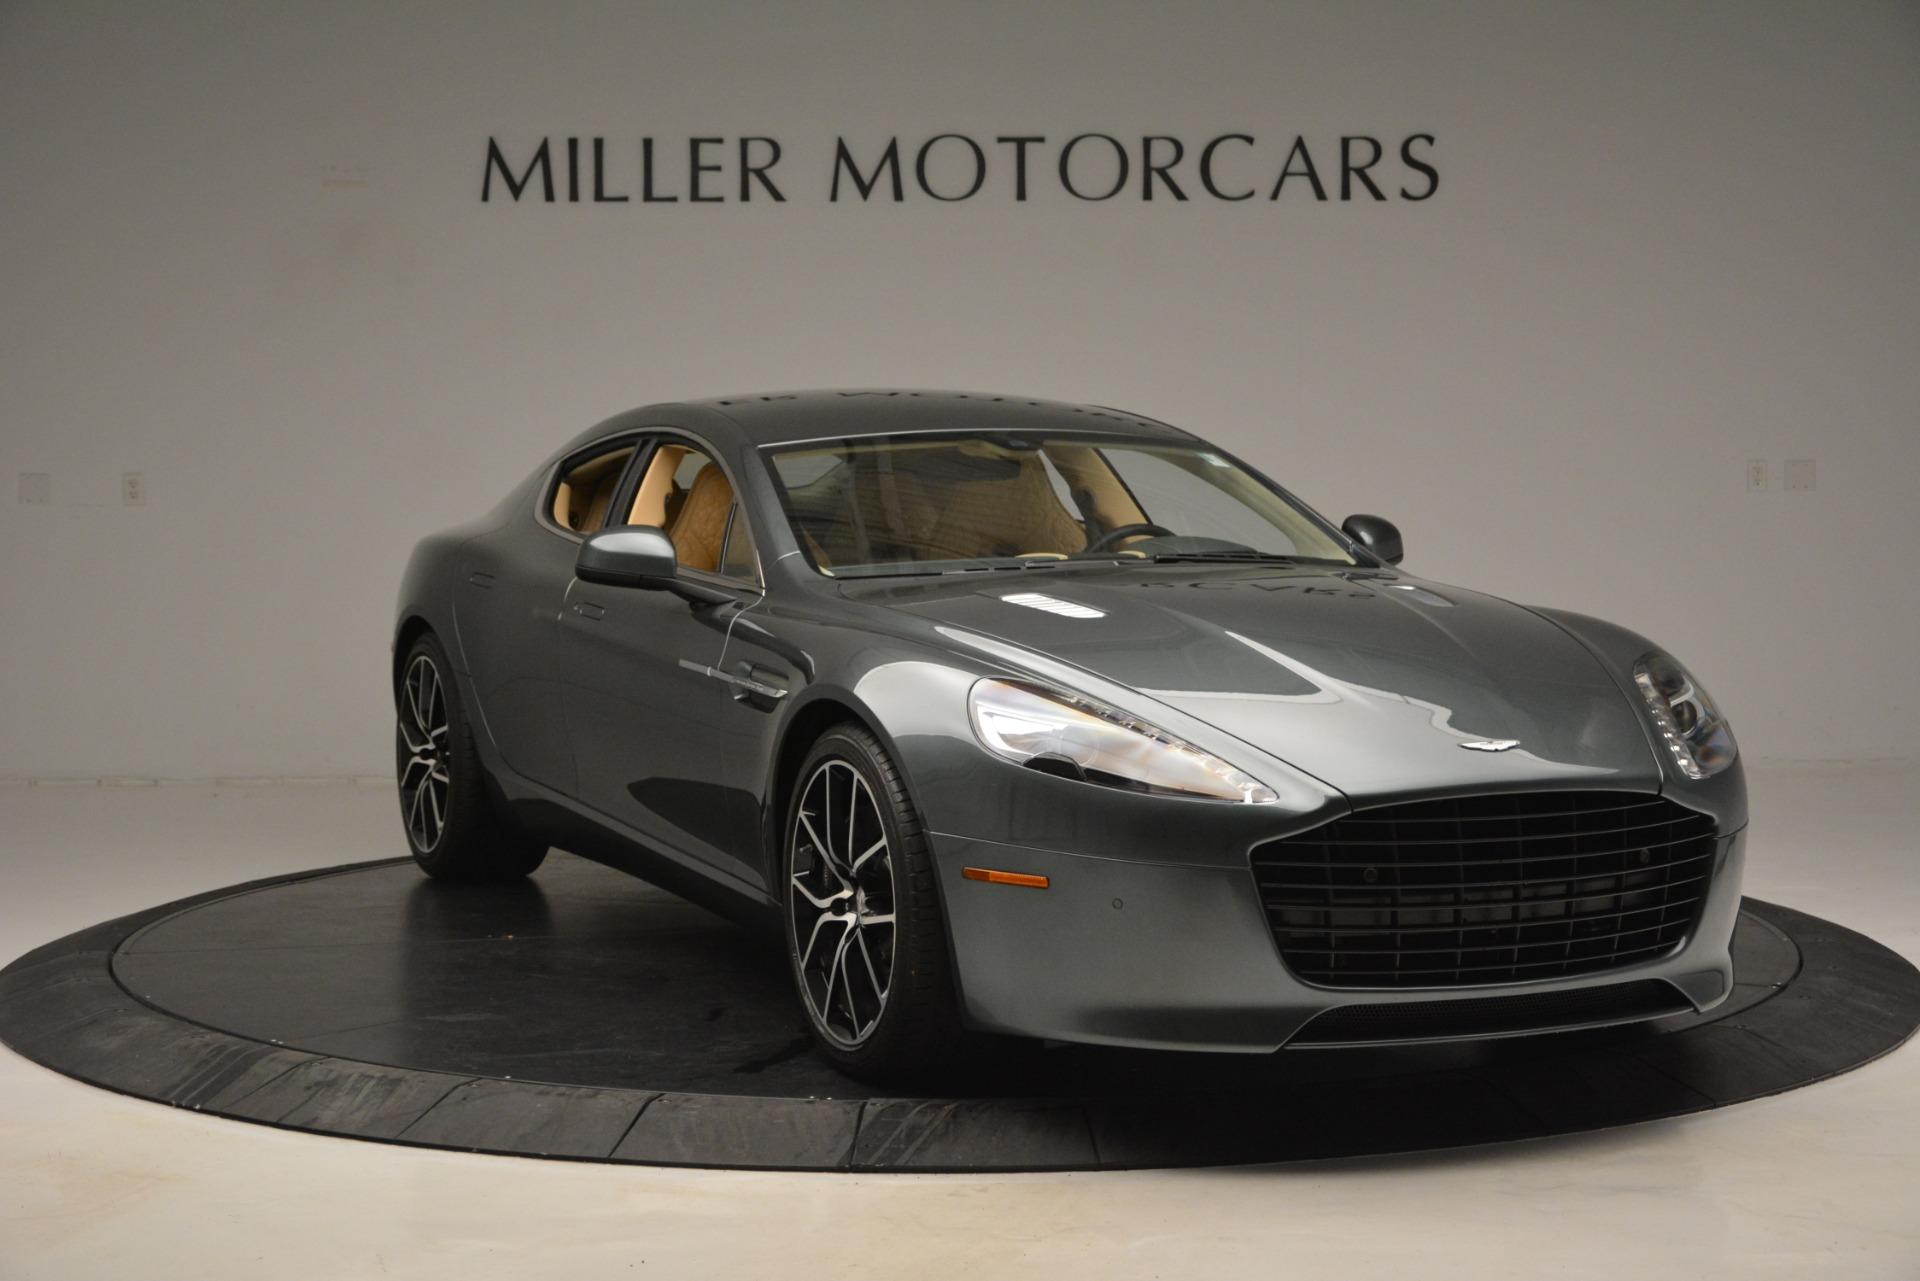 Used 2017 Aston Martin Rapide S Sedan For Sale In Greenwich, CT 2889_p11